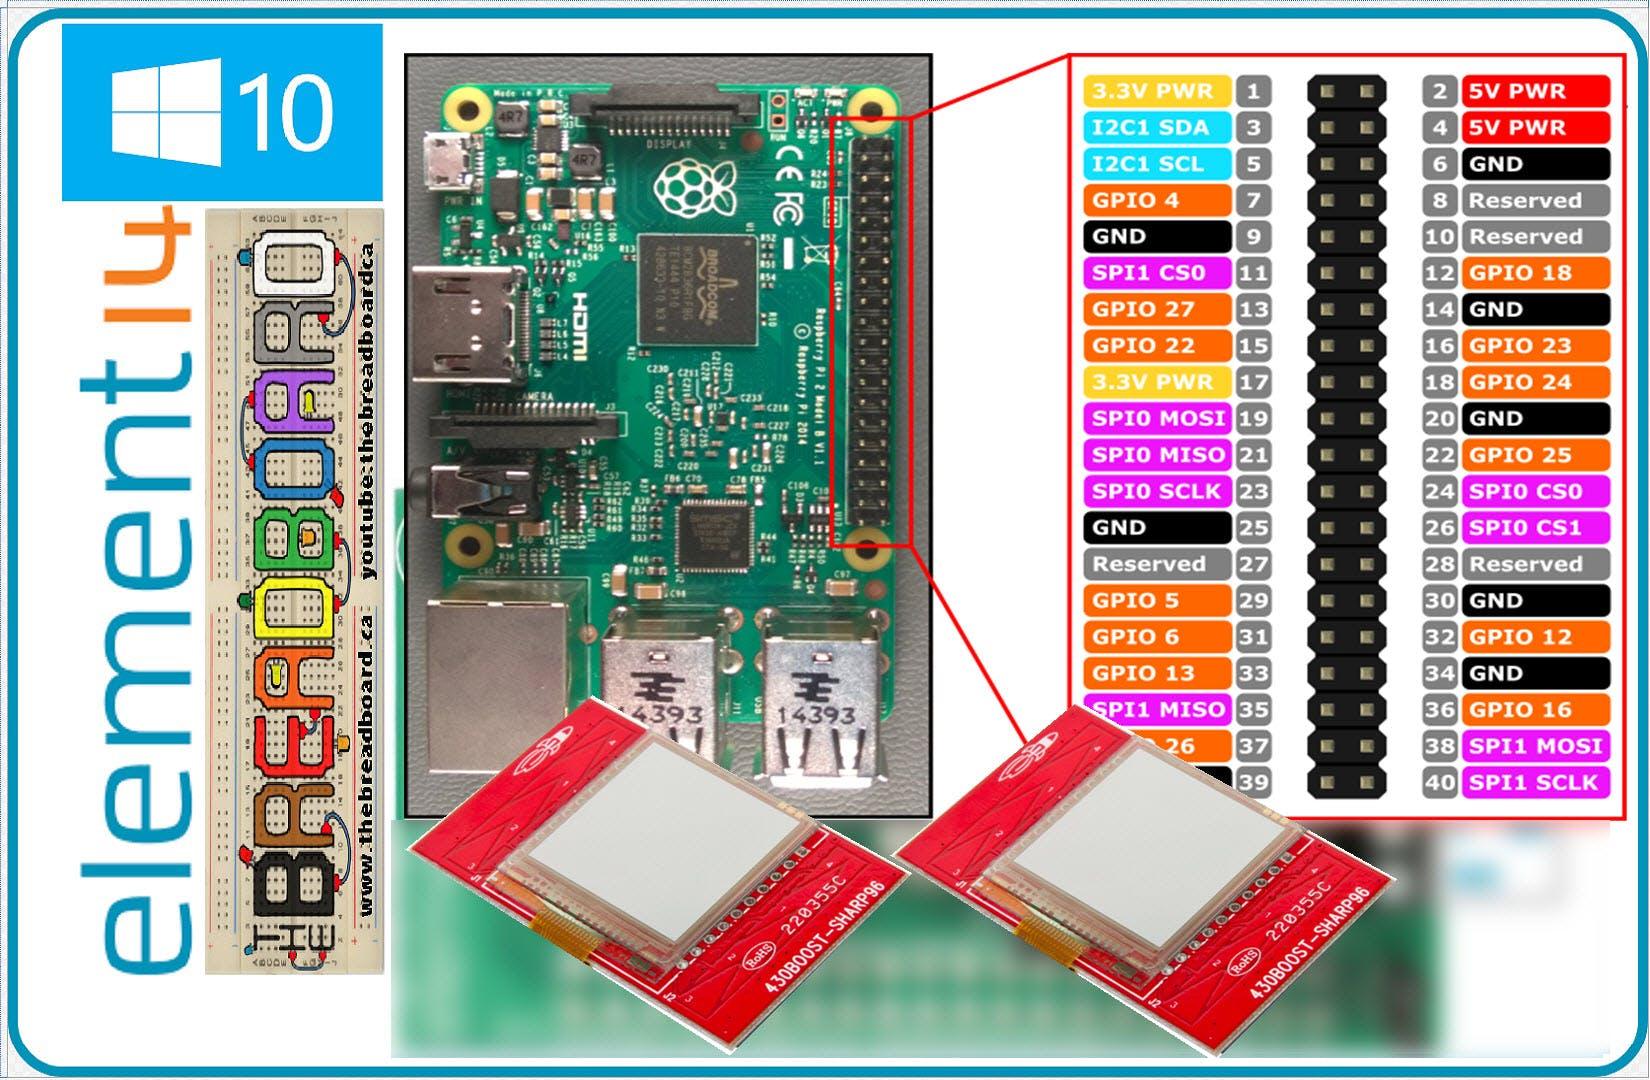 SHARP96 LCD Displays on a PI 2, Windows 10 IoT